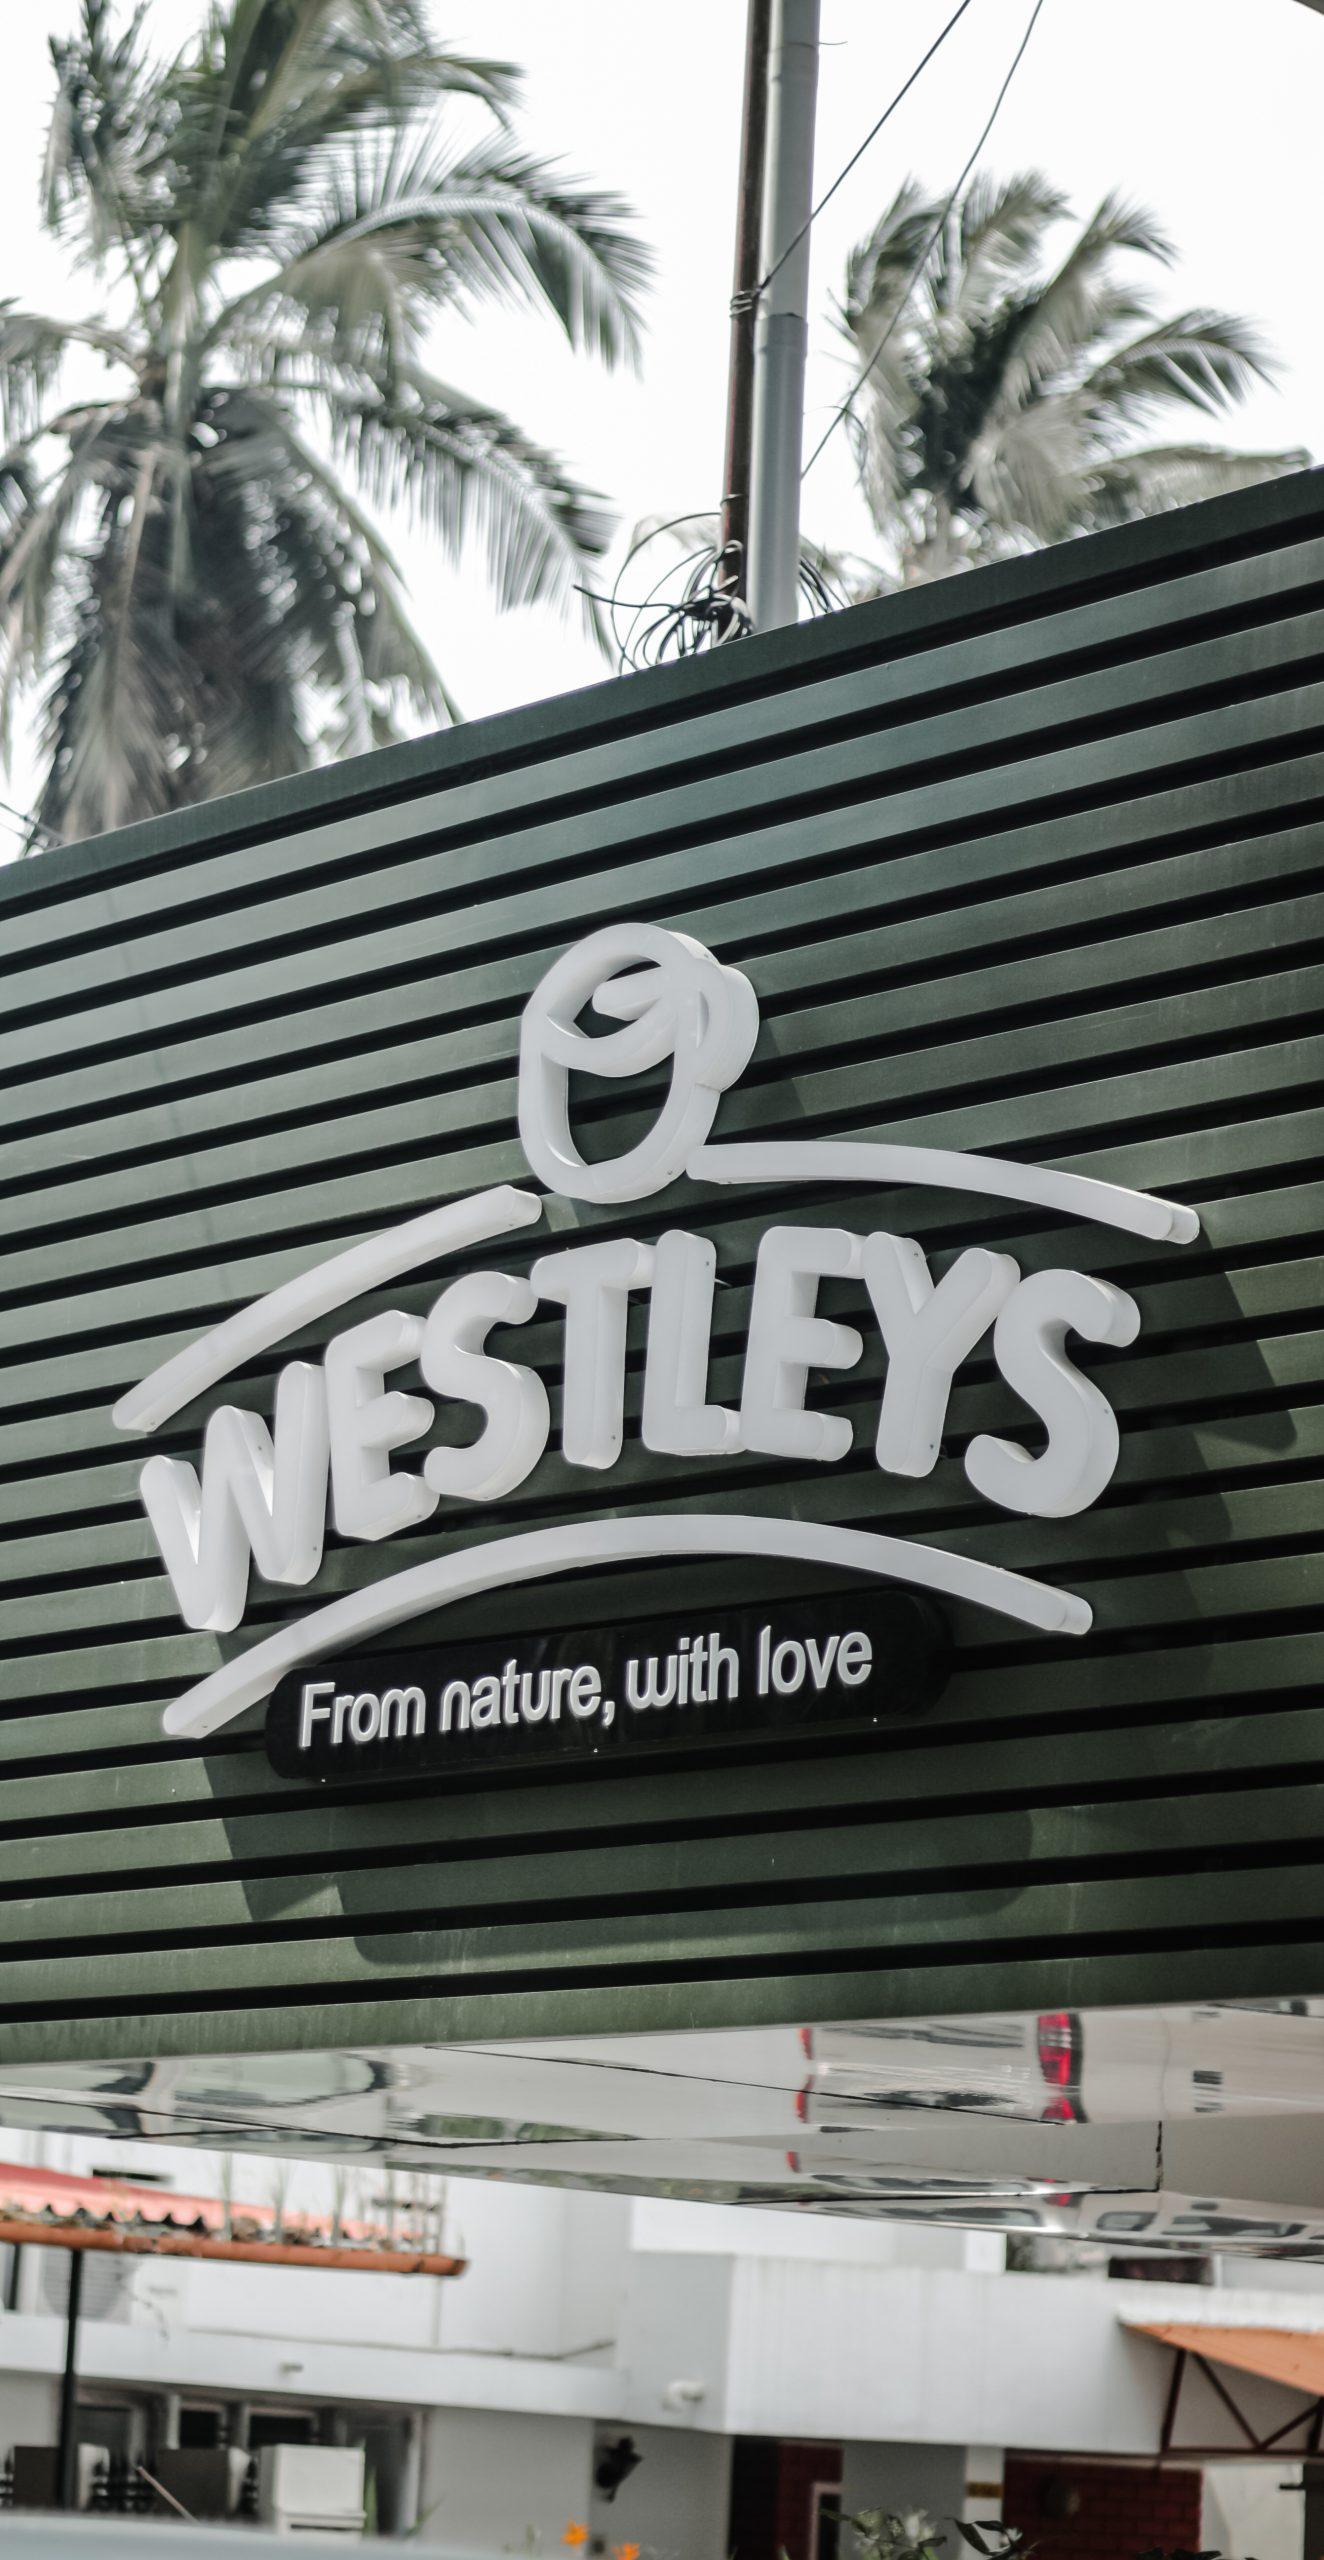 Westleys restaurant